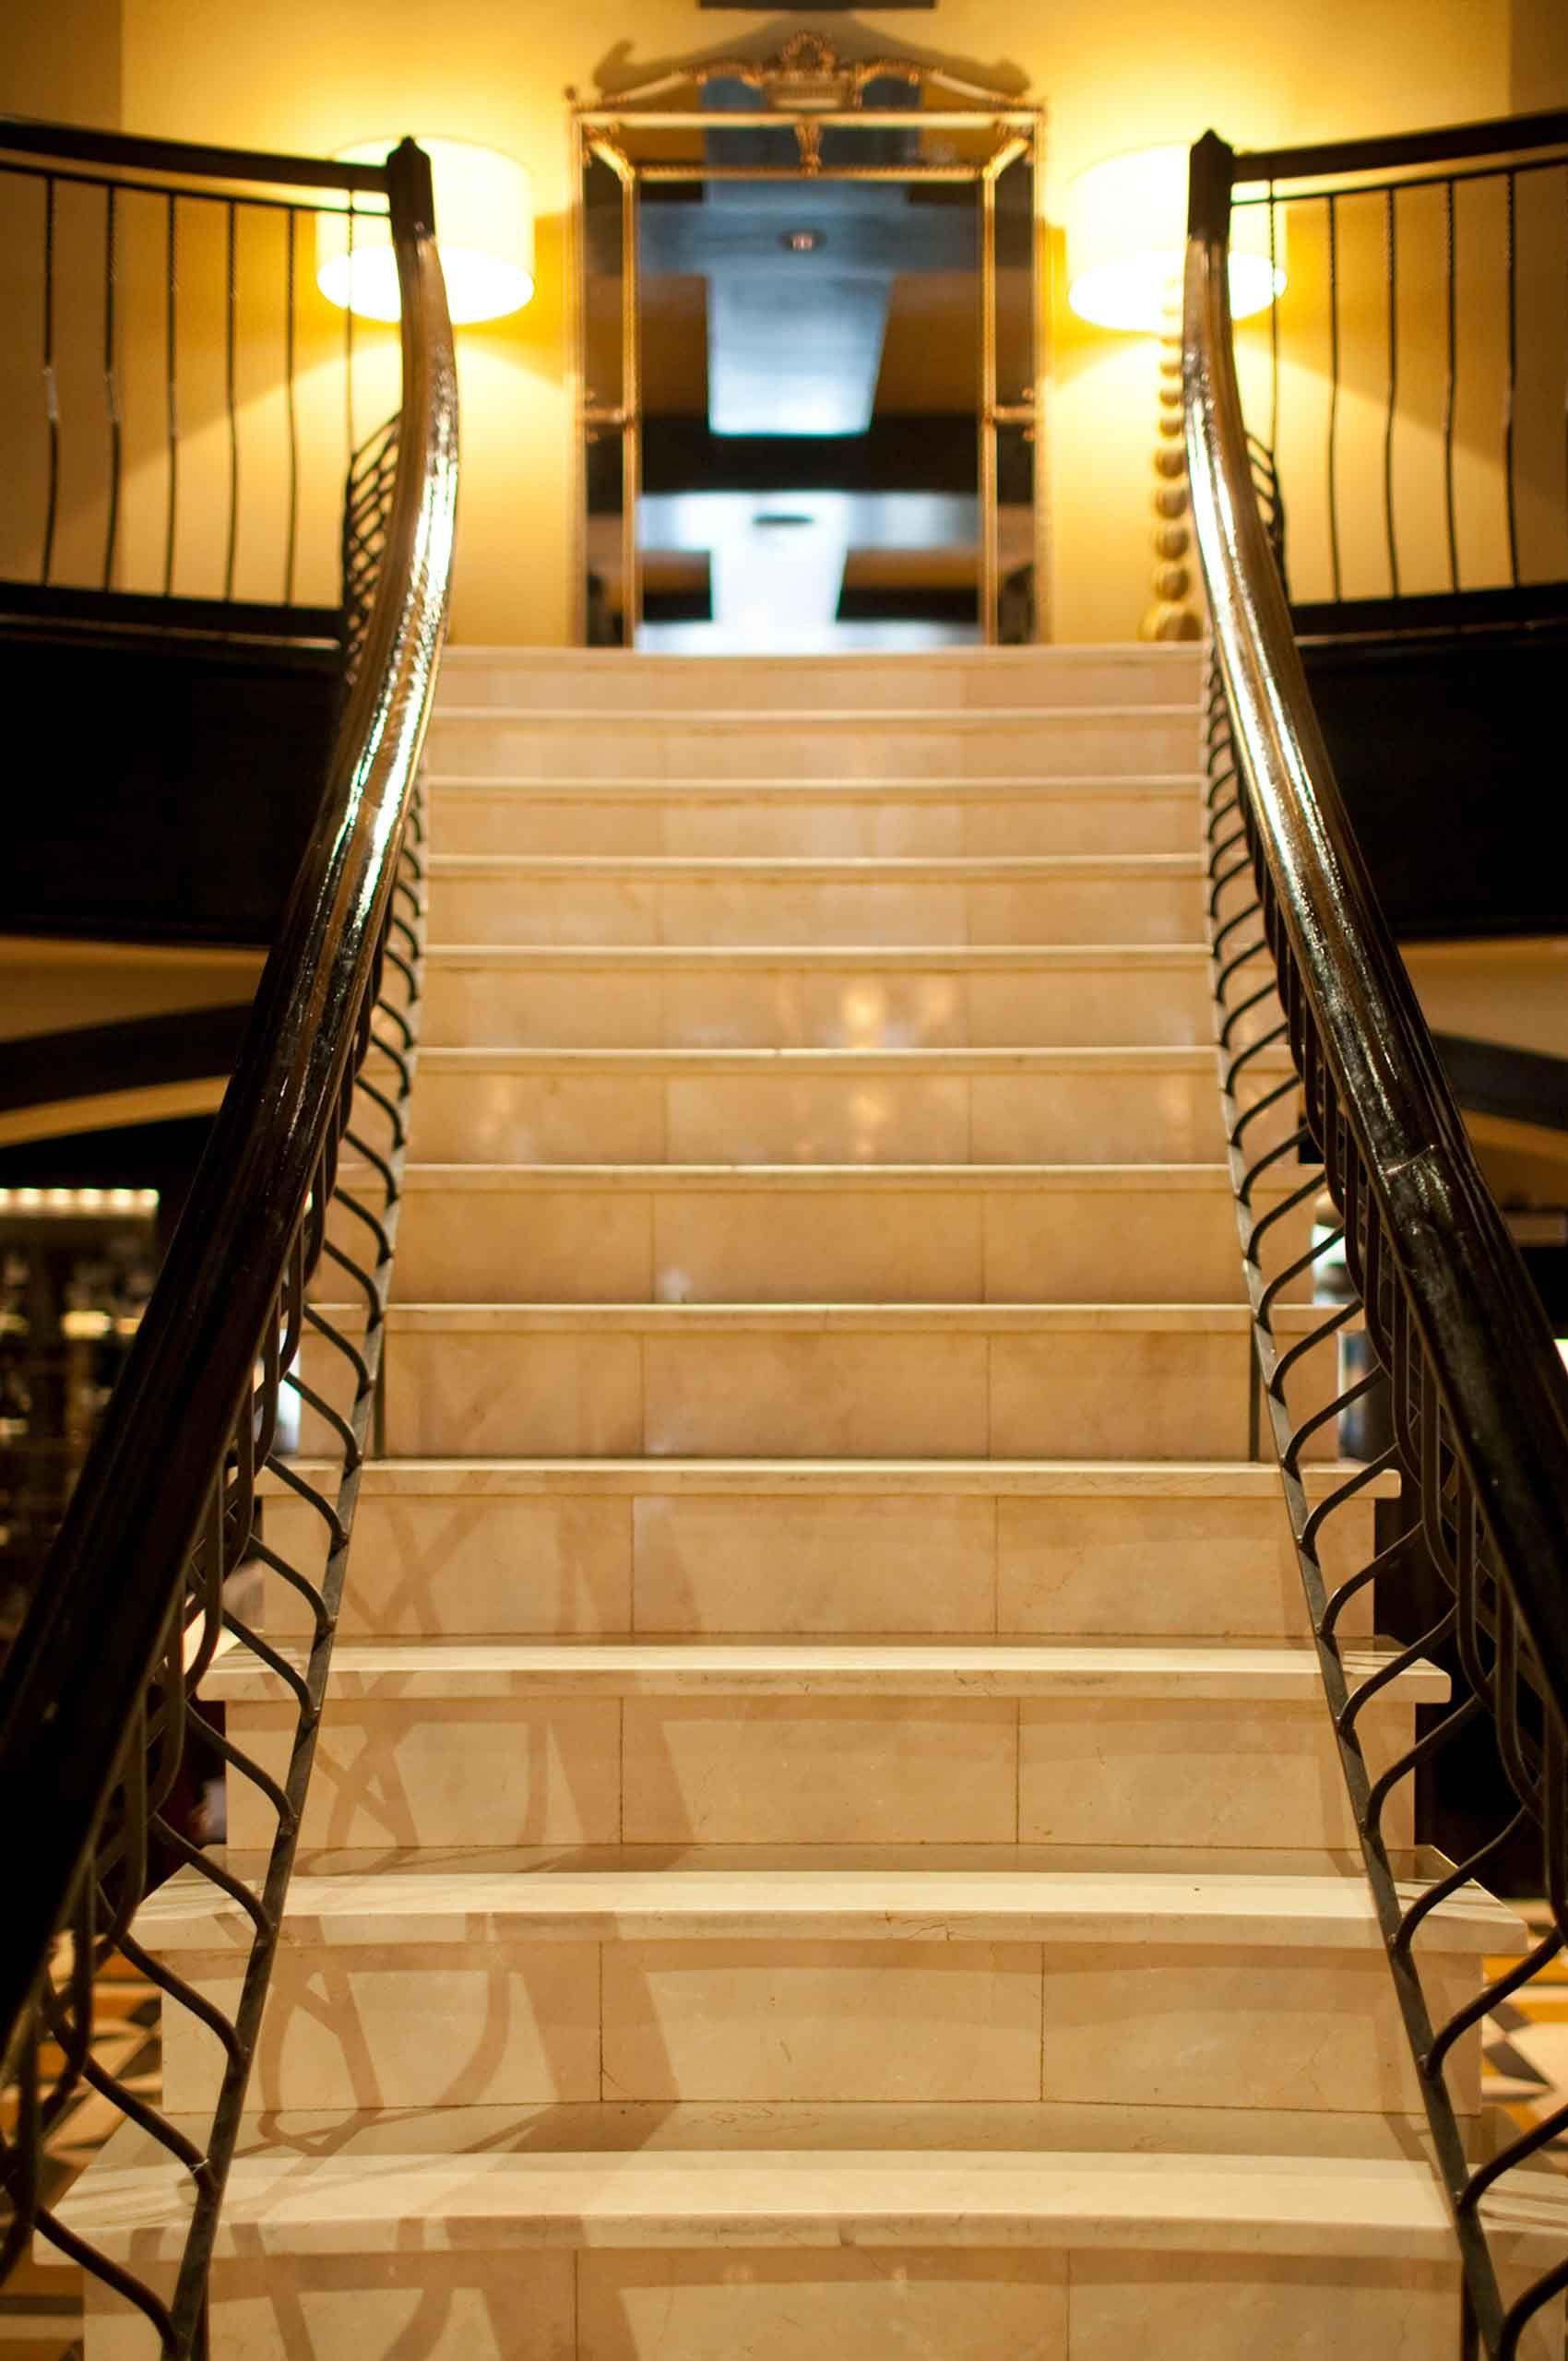 DelPosto-Staircase-InteriorDetail-by-HenrikOlundPhotography.jpg